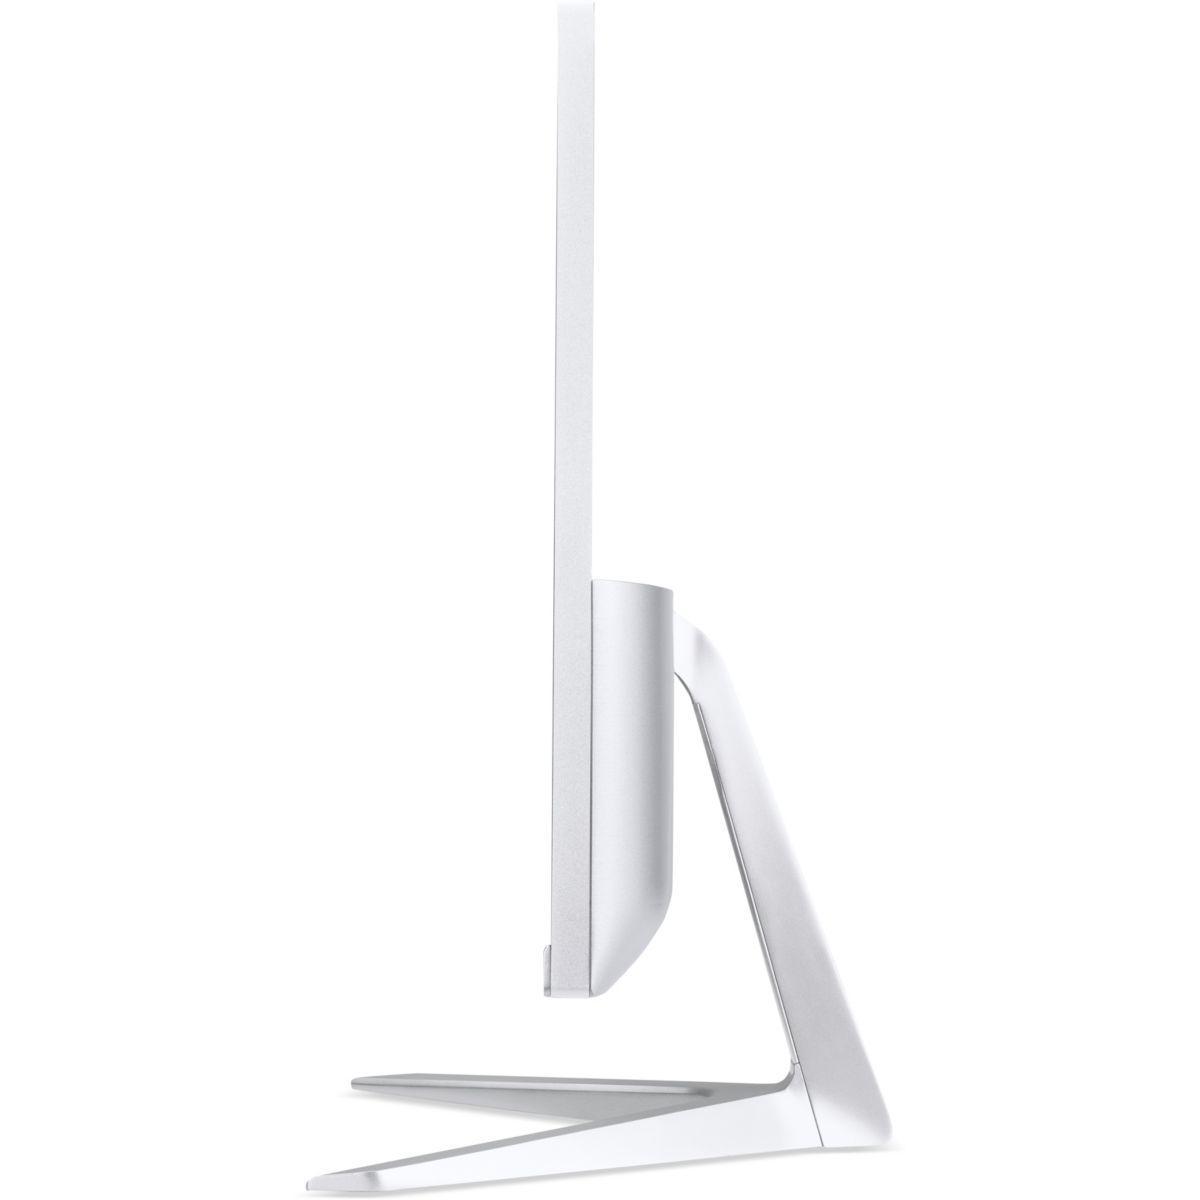 Acer Aspire C22-860-002 19,5-inch Core i5 2,5 GHz - HDD 1 TB - 4GB